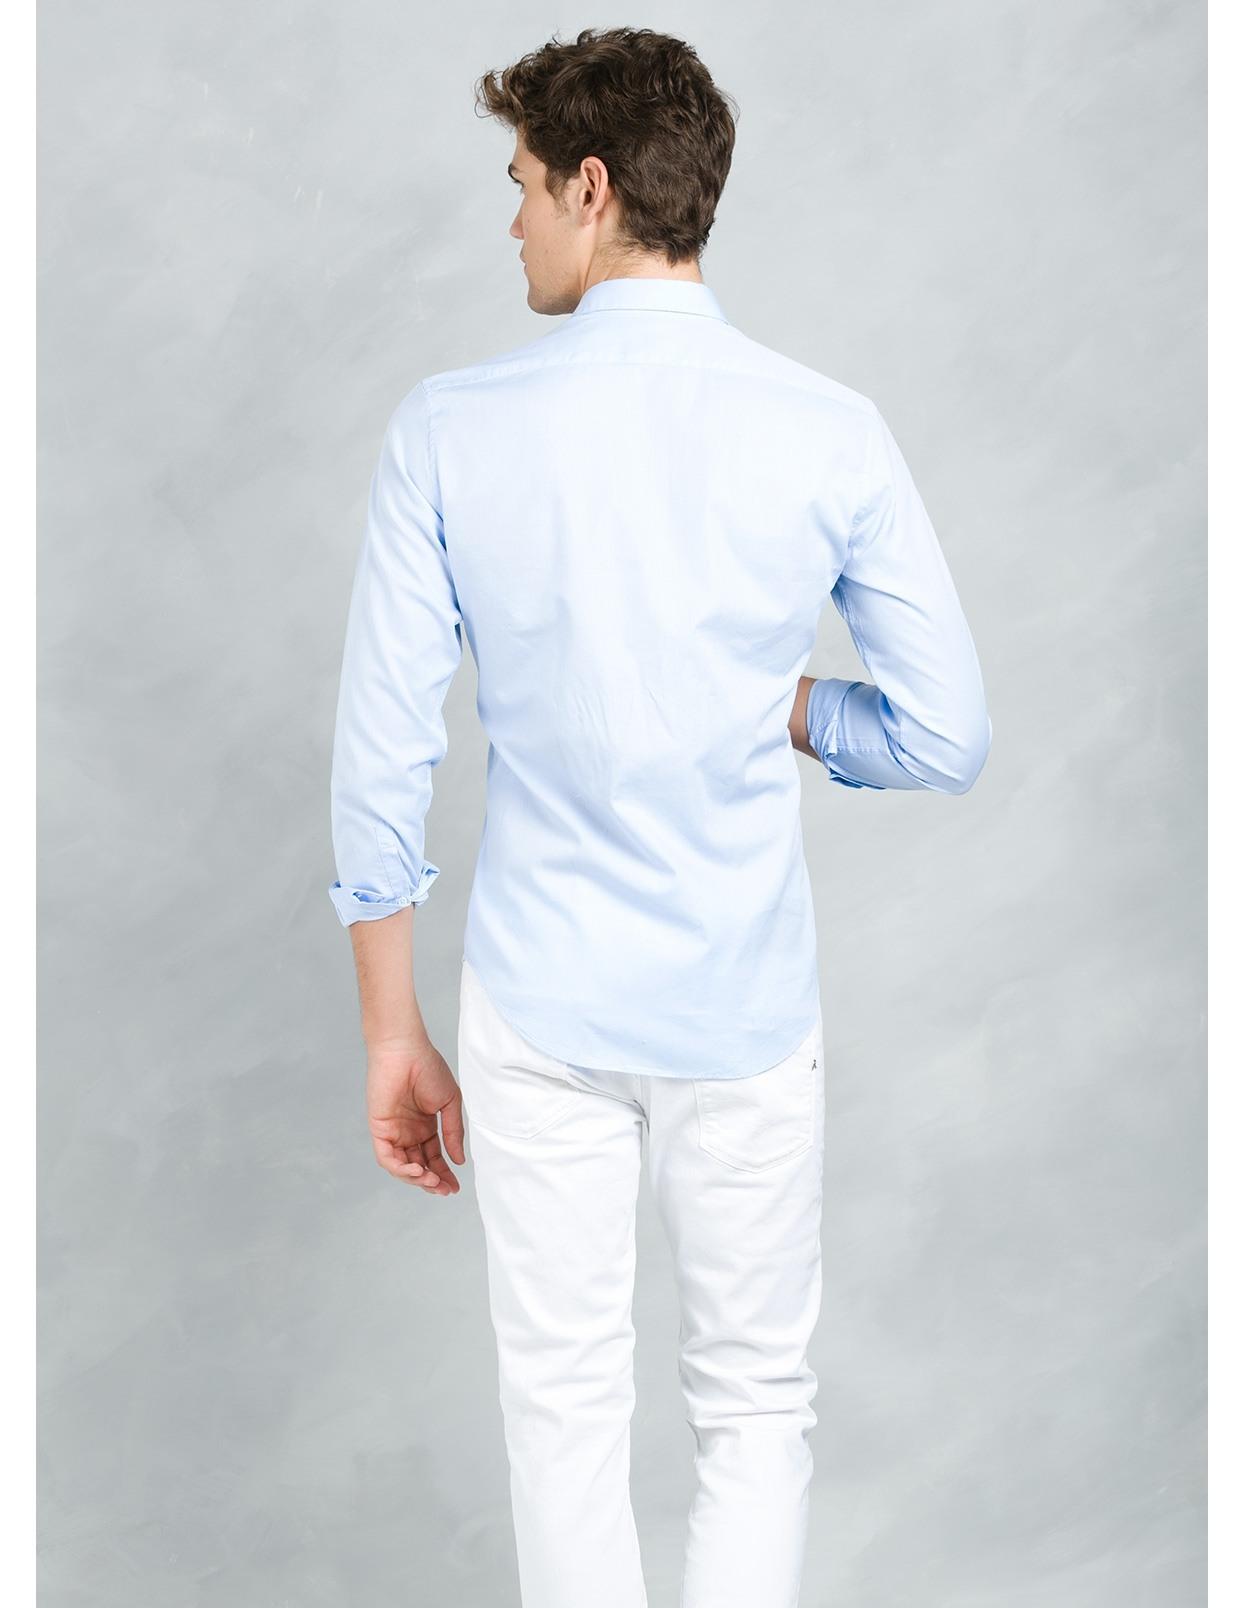 Camisa sport SLIM FIT modelo MATTIA RL, color azul, 100% Algodón. - Ítem2